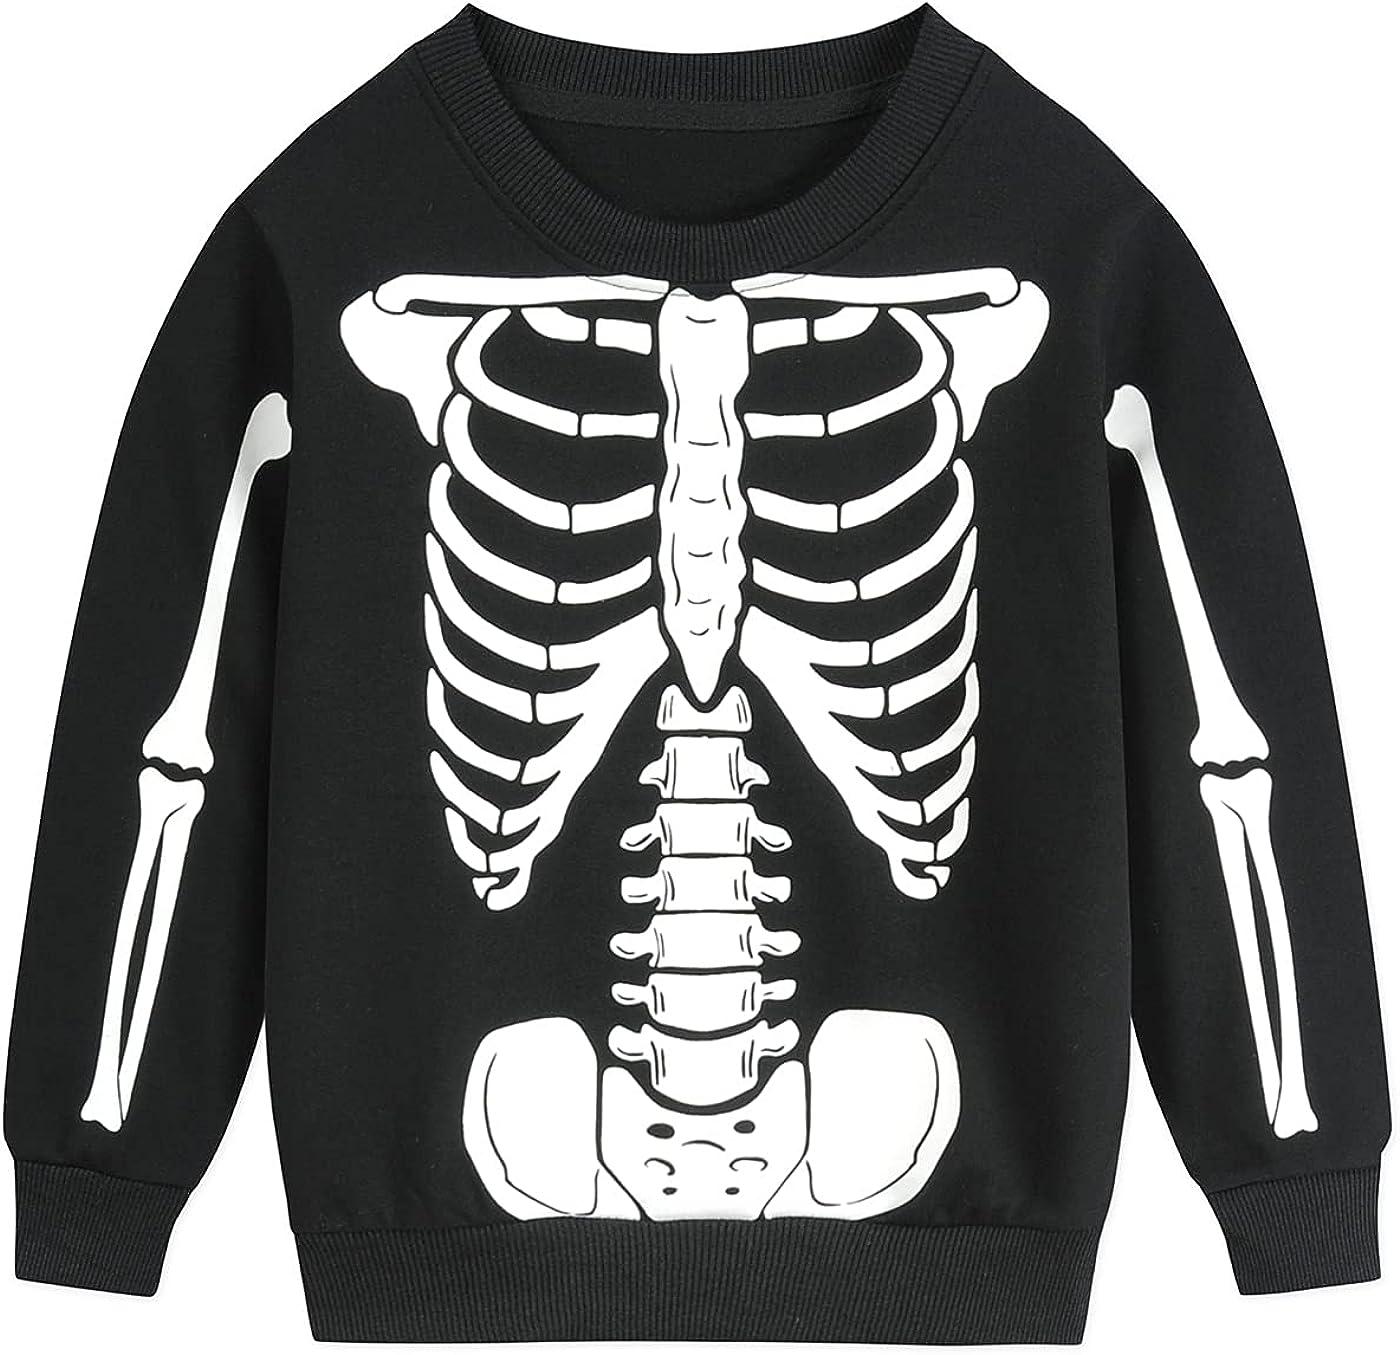 Toddler Boys Sweatshirts Halloween Kids Skeleton Pullover Pumpkin Long Sleeve Shirts 2-7 Years